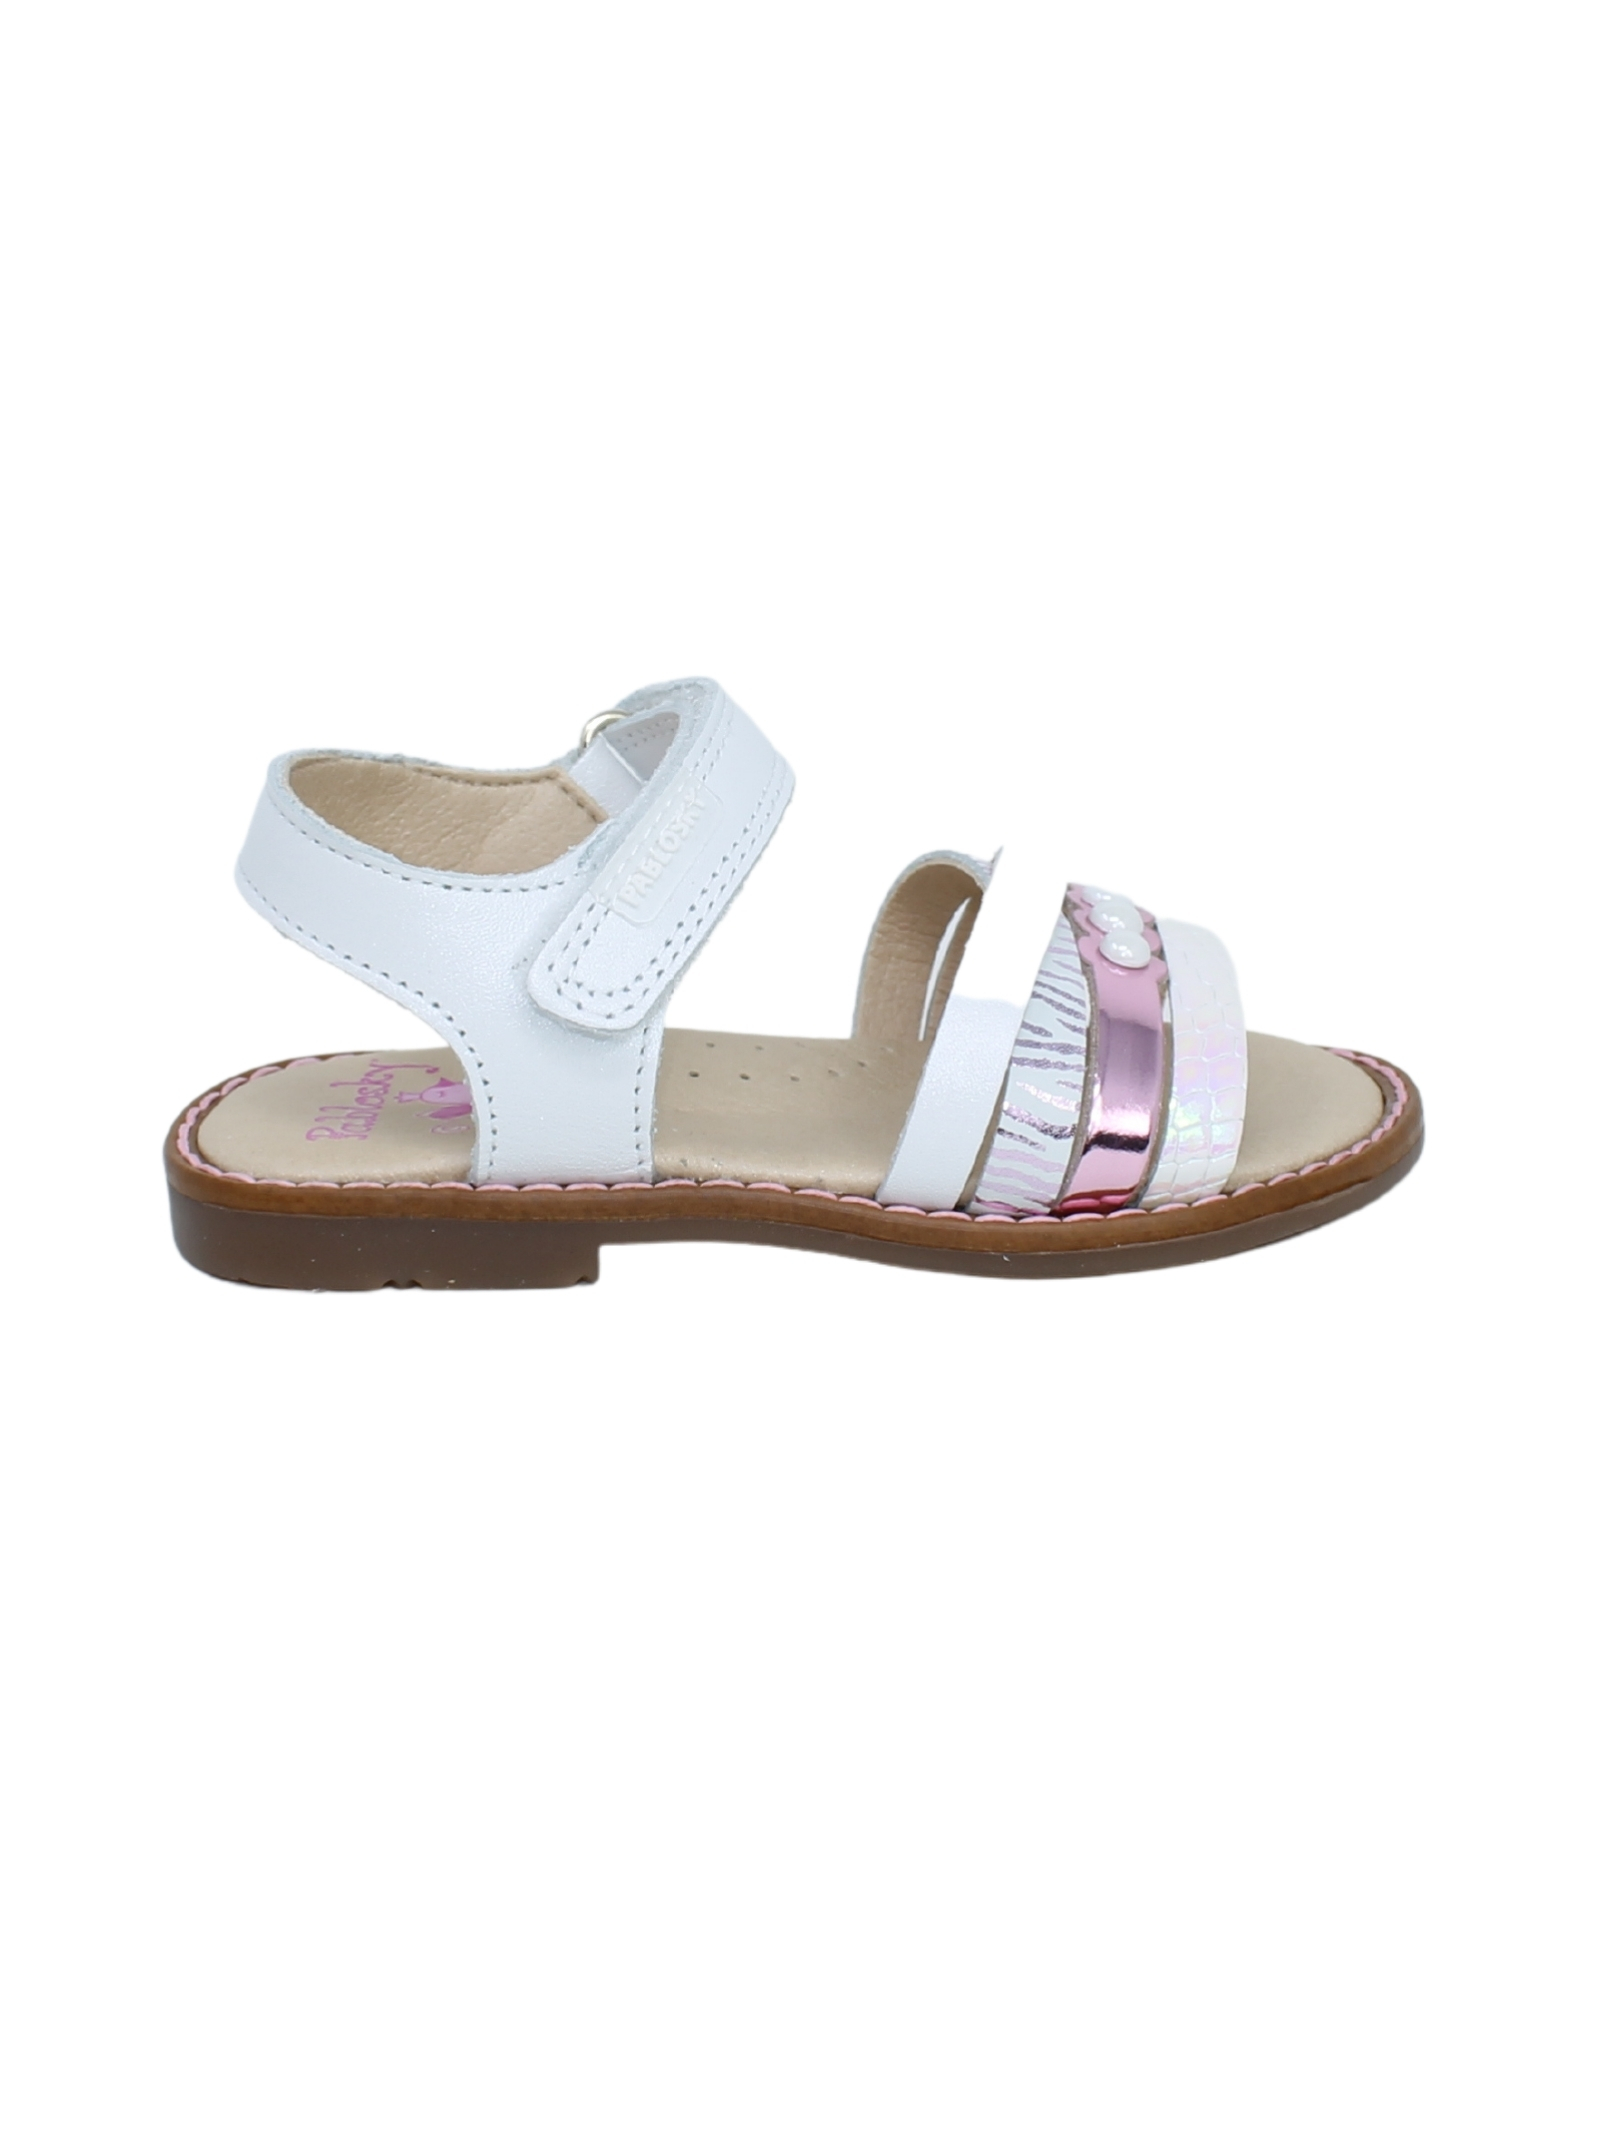 Sandalo Bambina Perline PABLOSKY | Sandali | 095307BIANCO